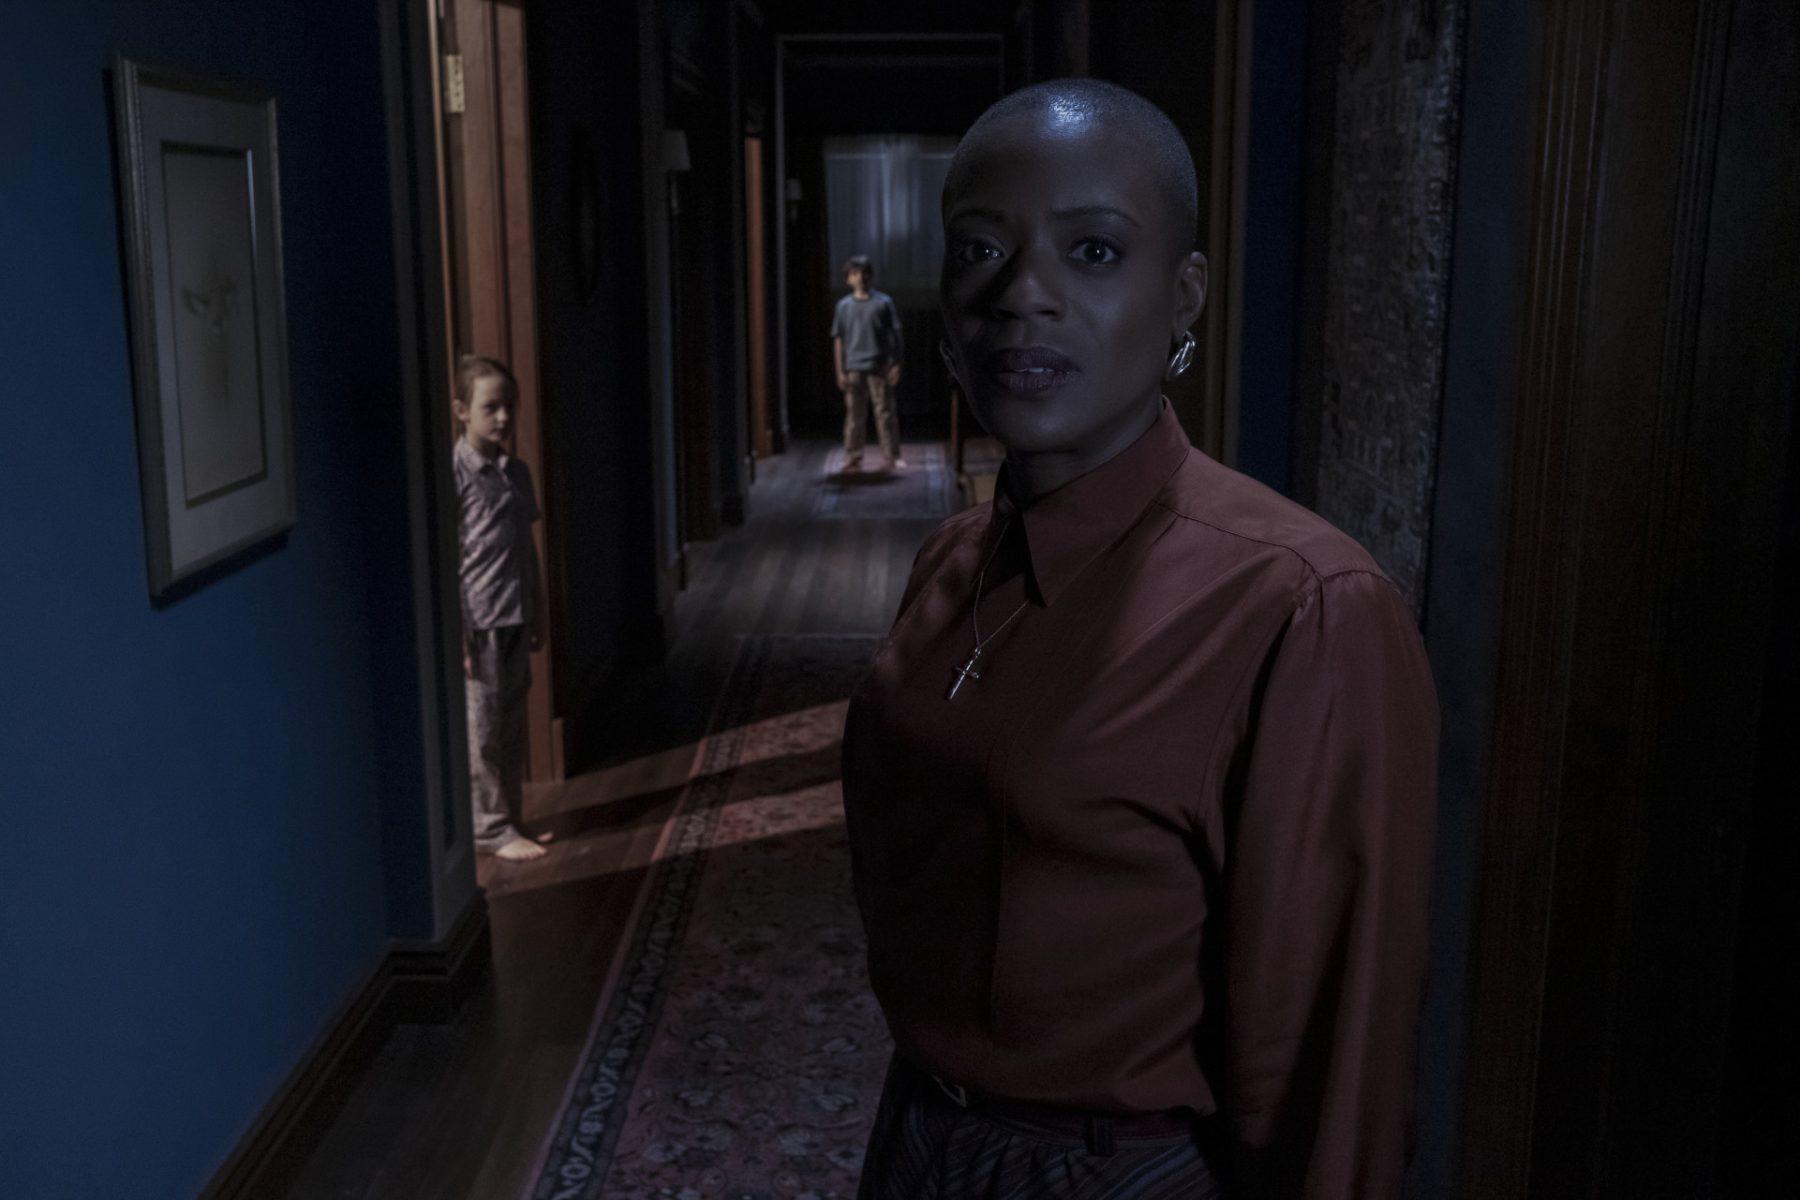 The Haunting of Bly Manor: Μέχρι το 4ο επεισόδιο απλά καλή, από το 5ο και μετά η πιο συναρπαστική σειρά της χρονιάς